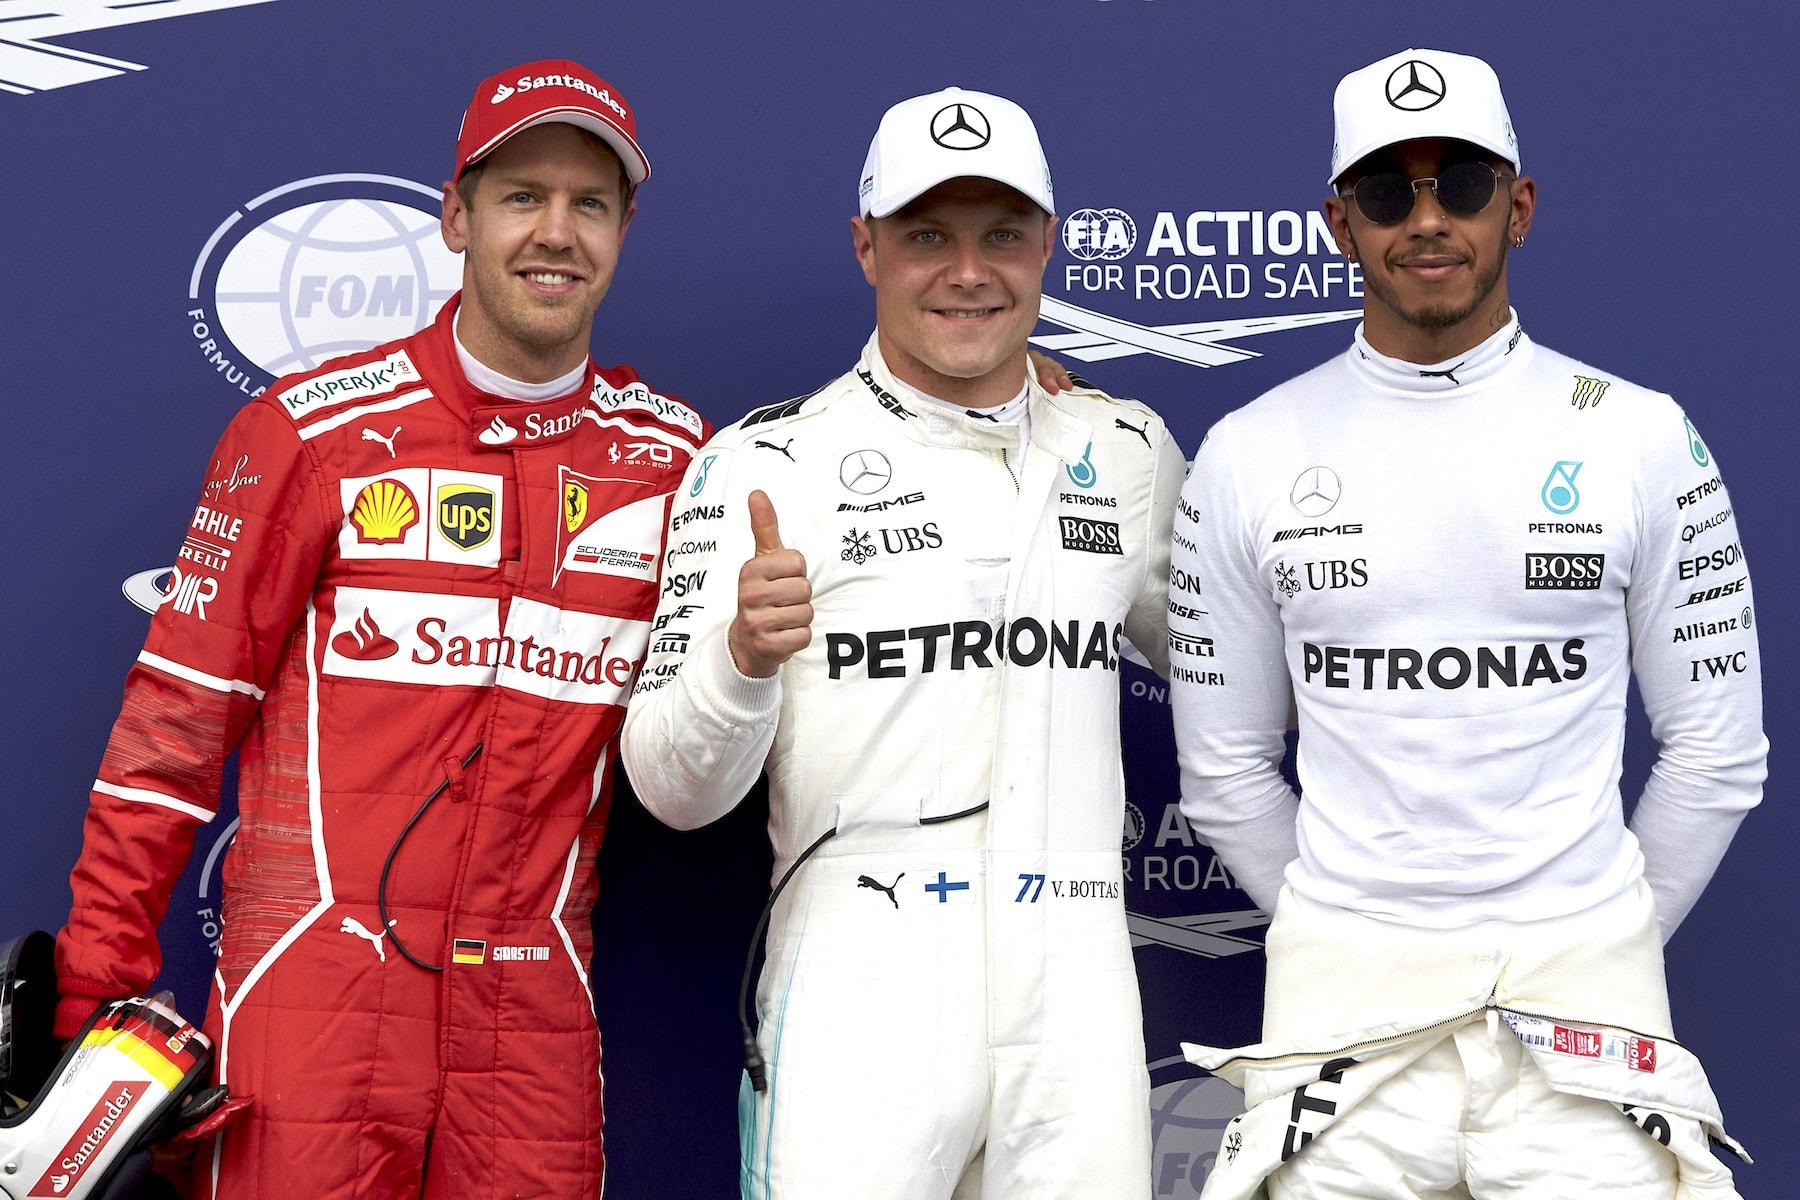 Z 2017 Austrian GP qualifying podium photo by © Steve Etherington for Mercedes-Benz Grand Prix Ltd. copy.JPG